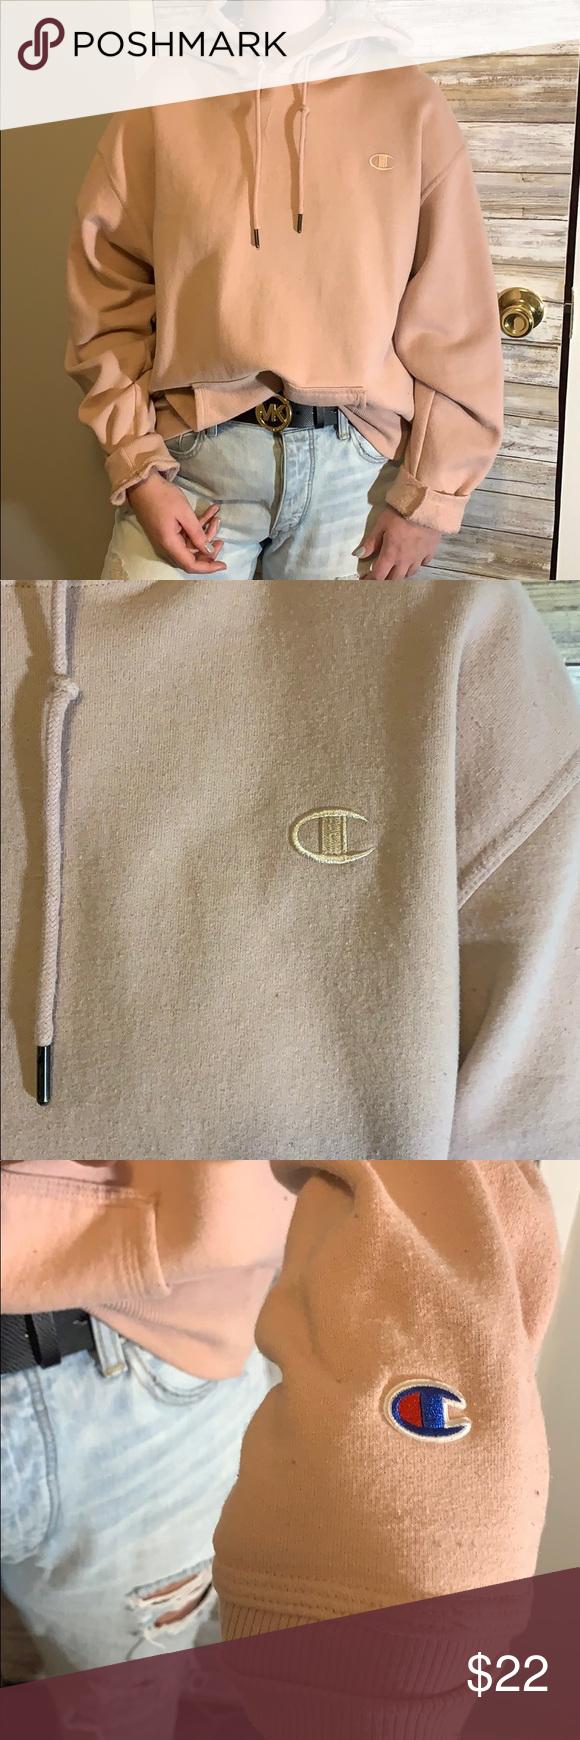 Champion hoodie Fits true to size! Champion hoodie! Champion Tops Sweatshirts & Hoodies #championhoodie